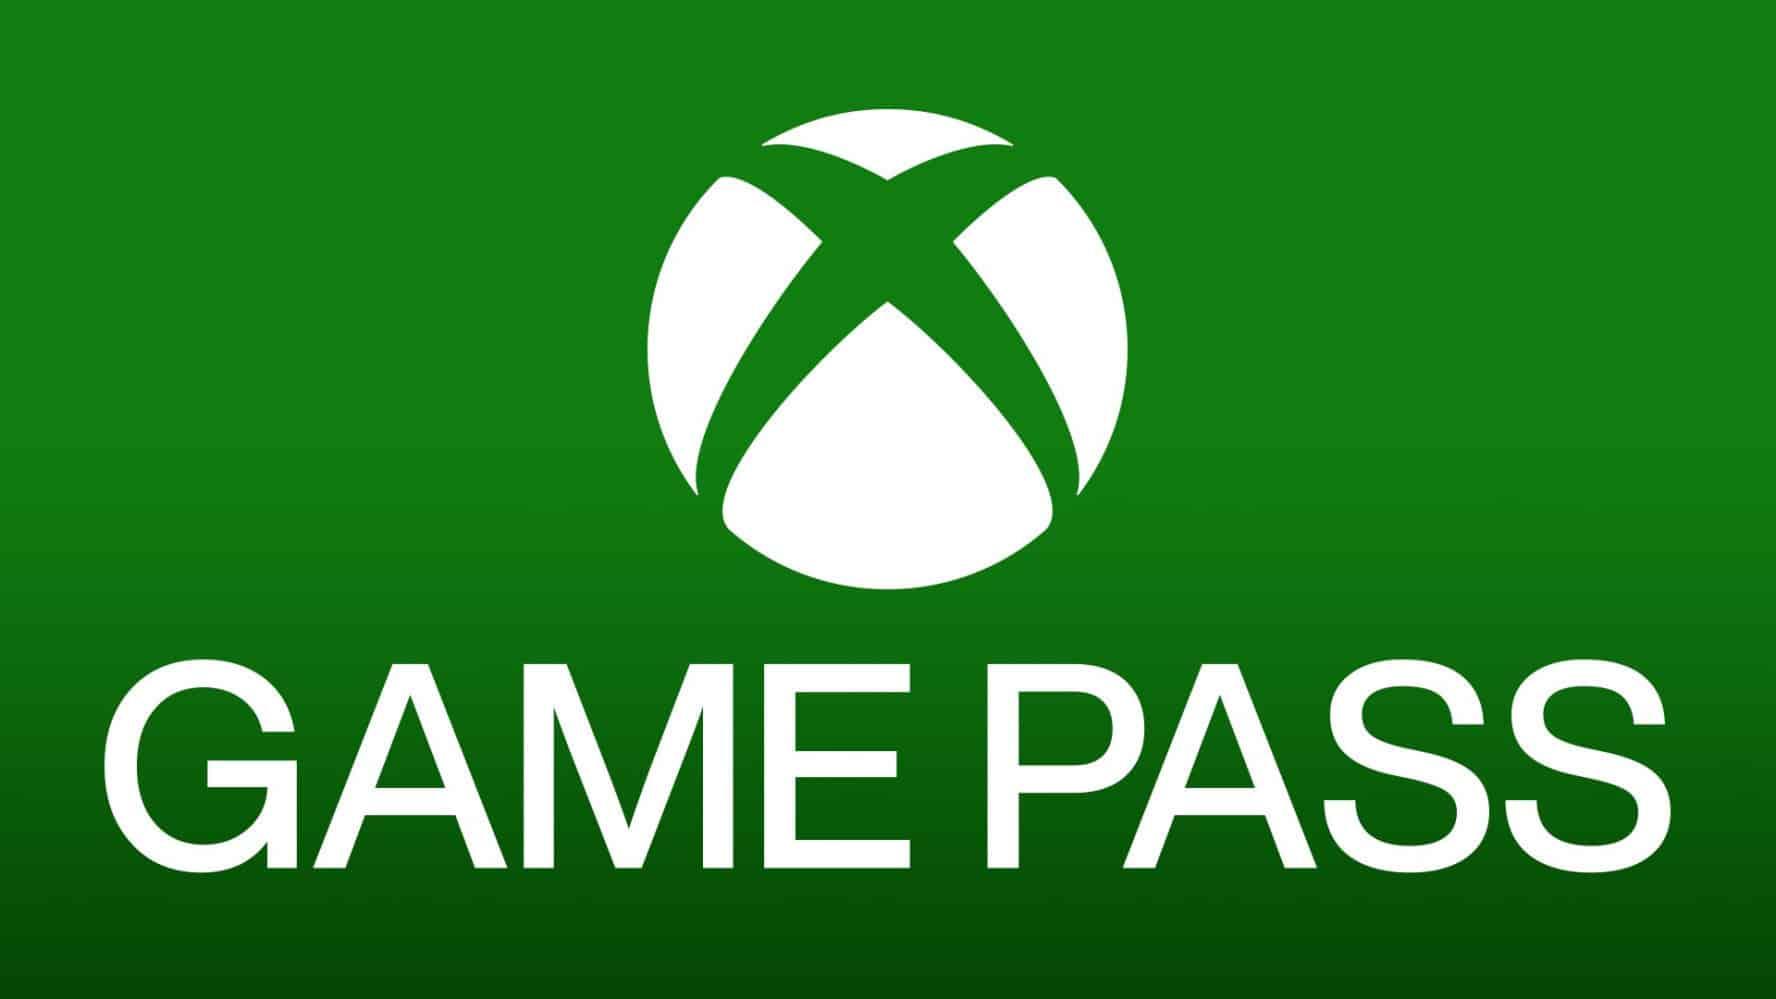 Xbox Game Pass logo